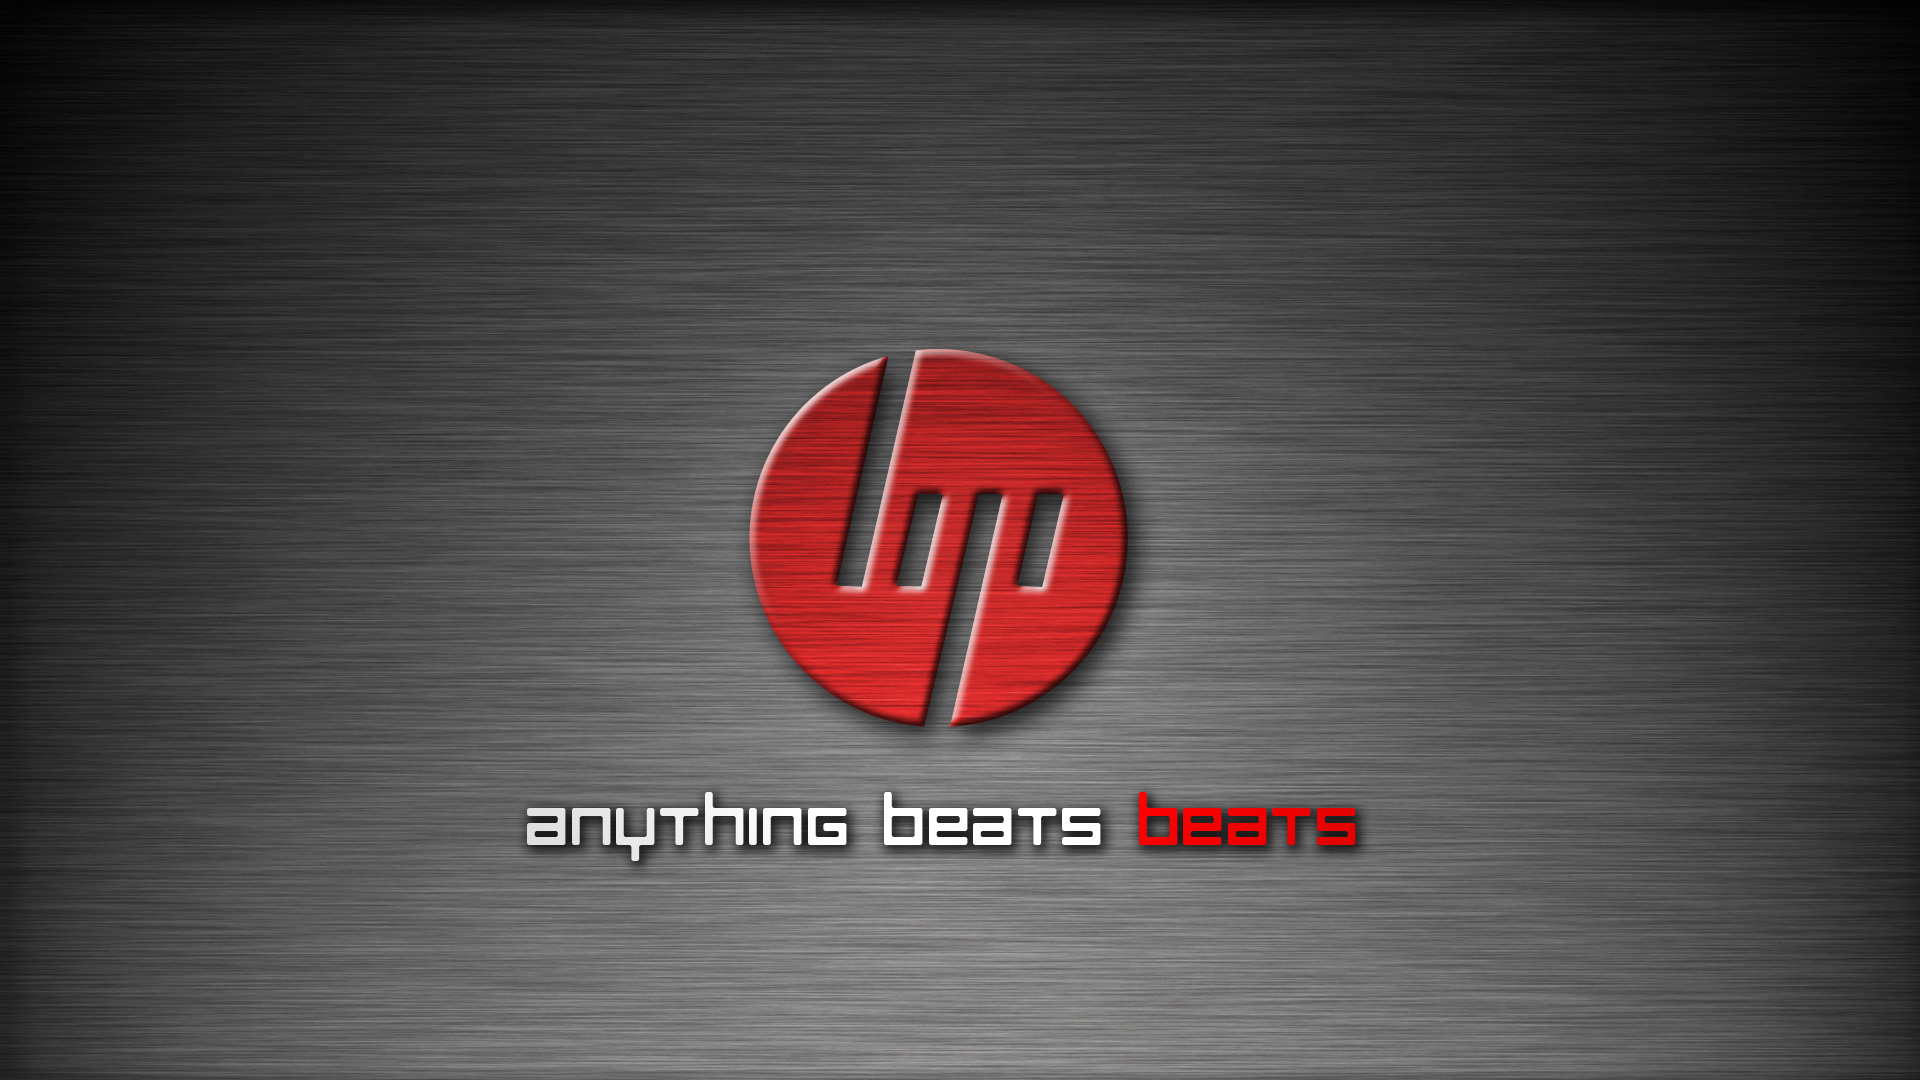 Hp Beats Wallpapers Hd 1920x1080